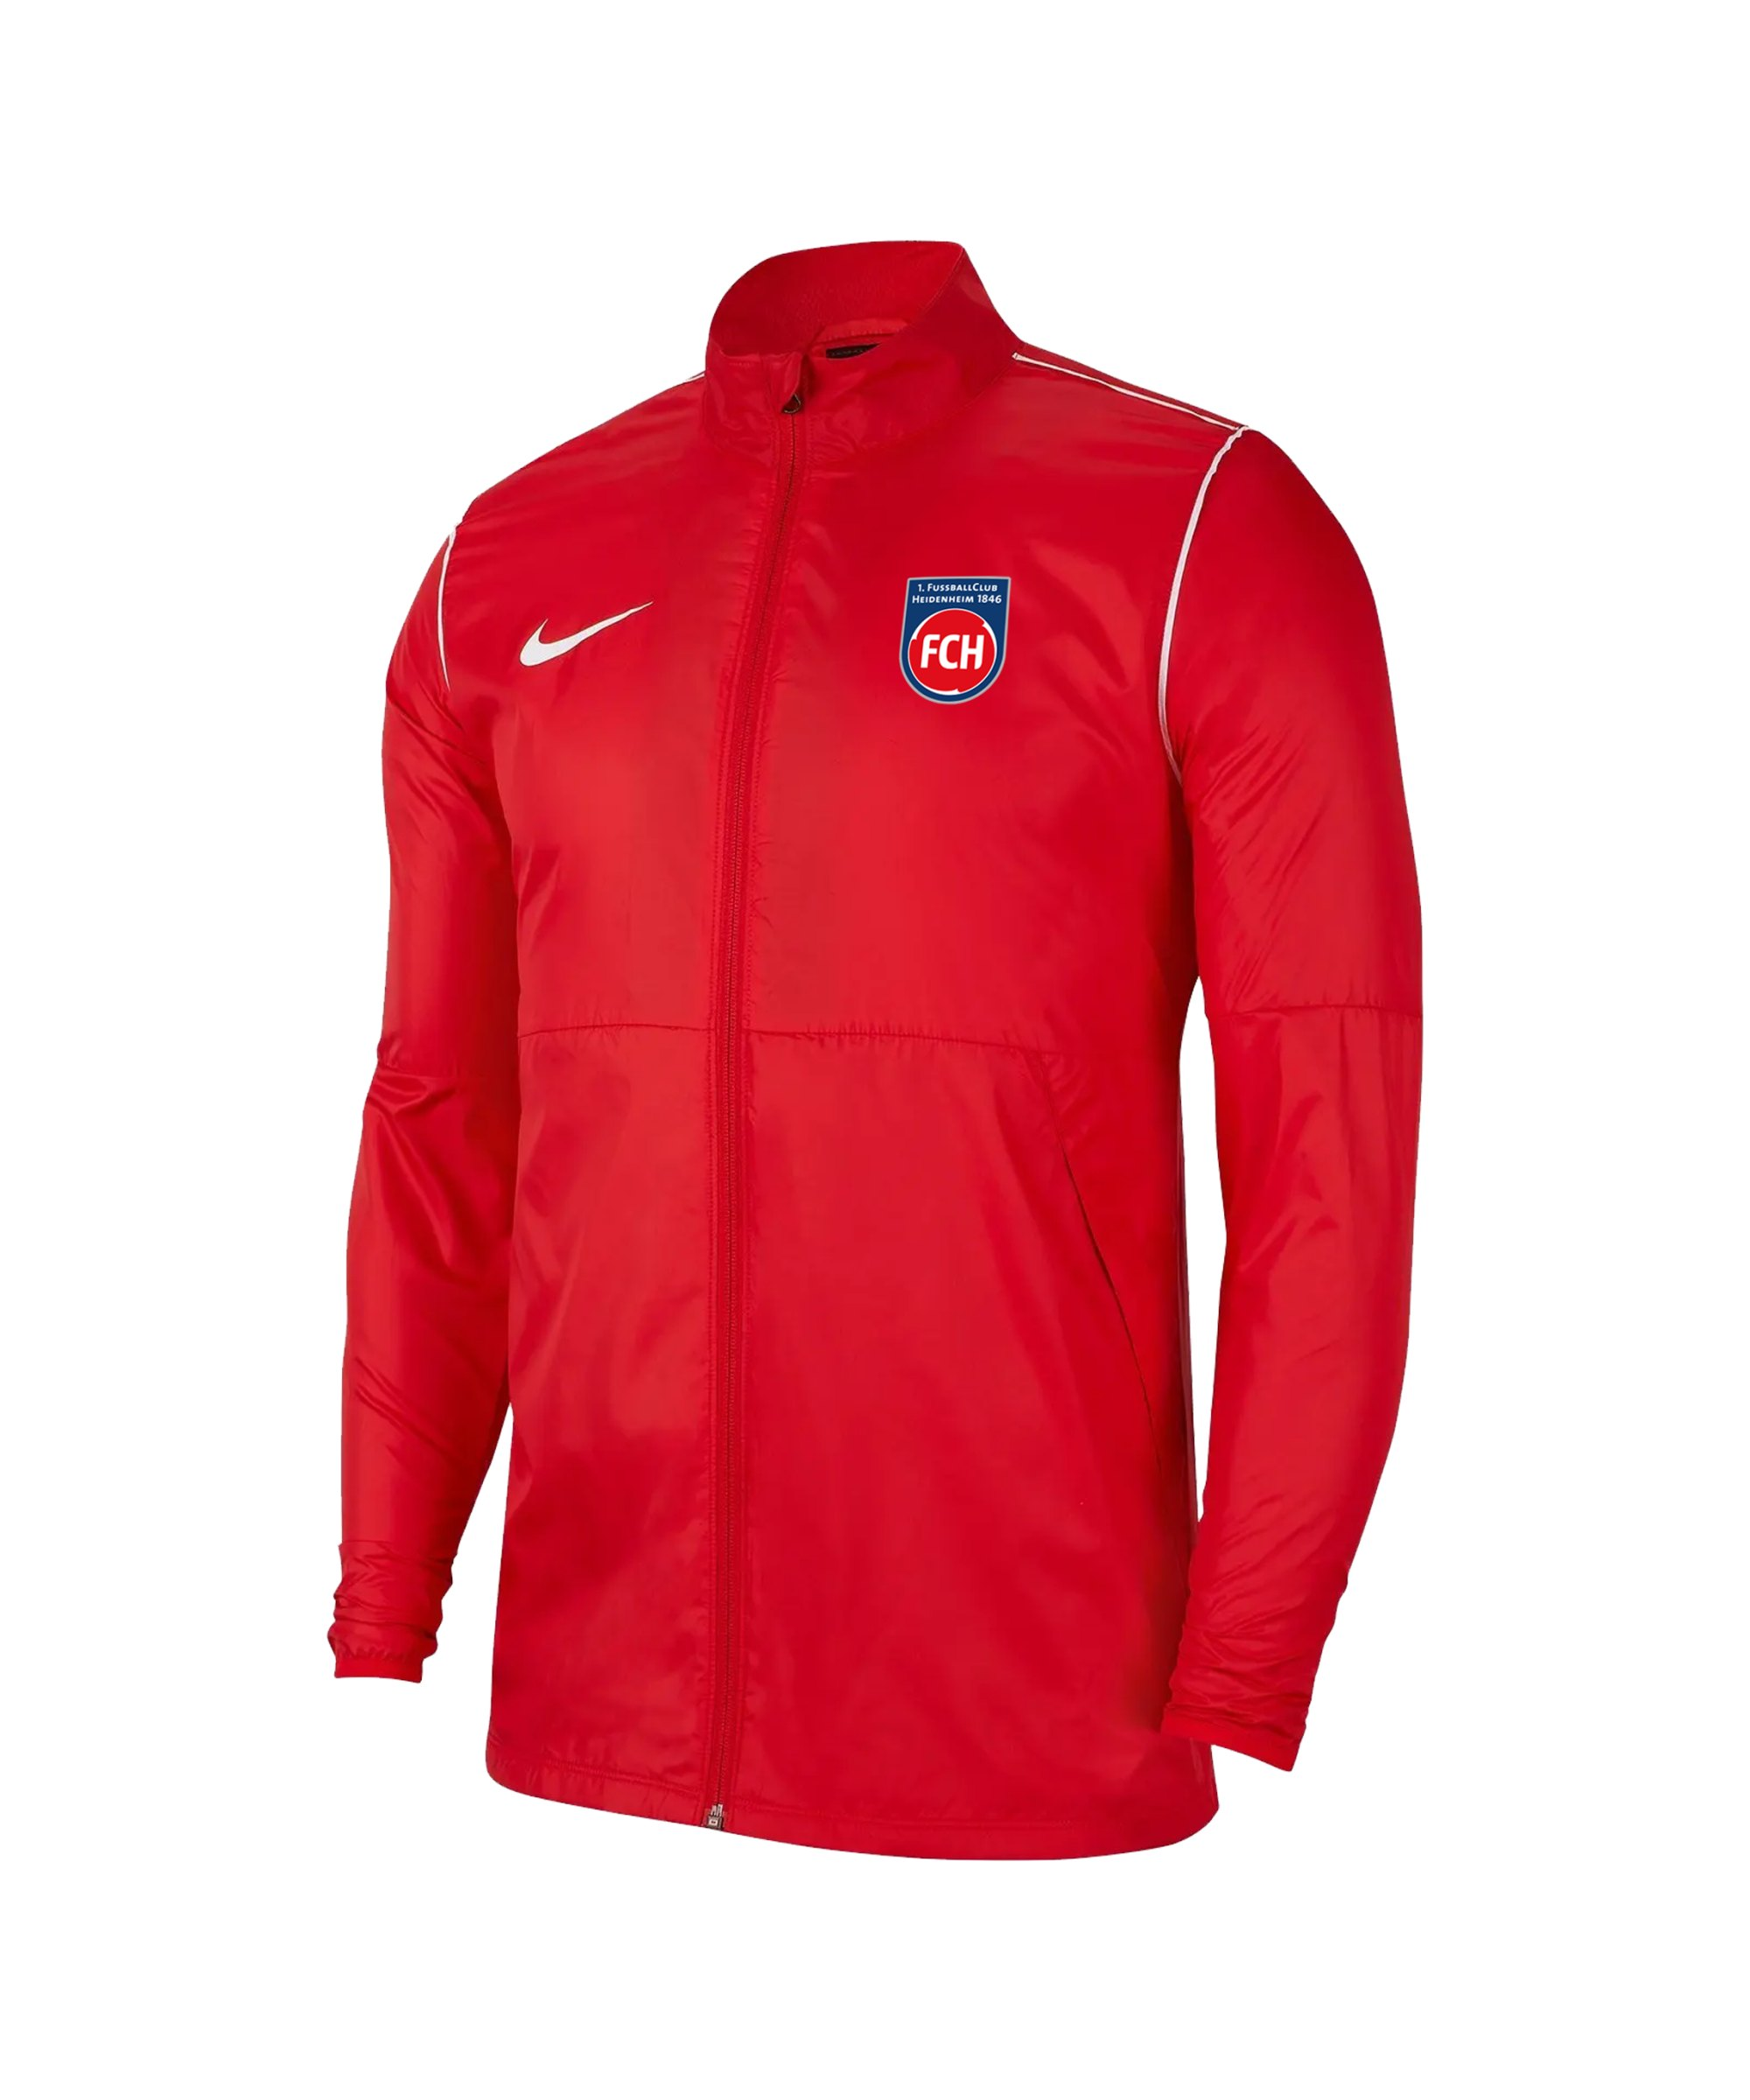 Nike 1. FC Heidenheim Regenjacke Rot F657 - rot